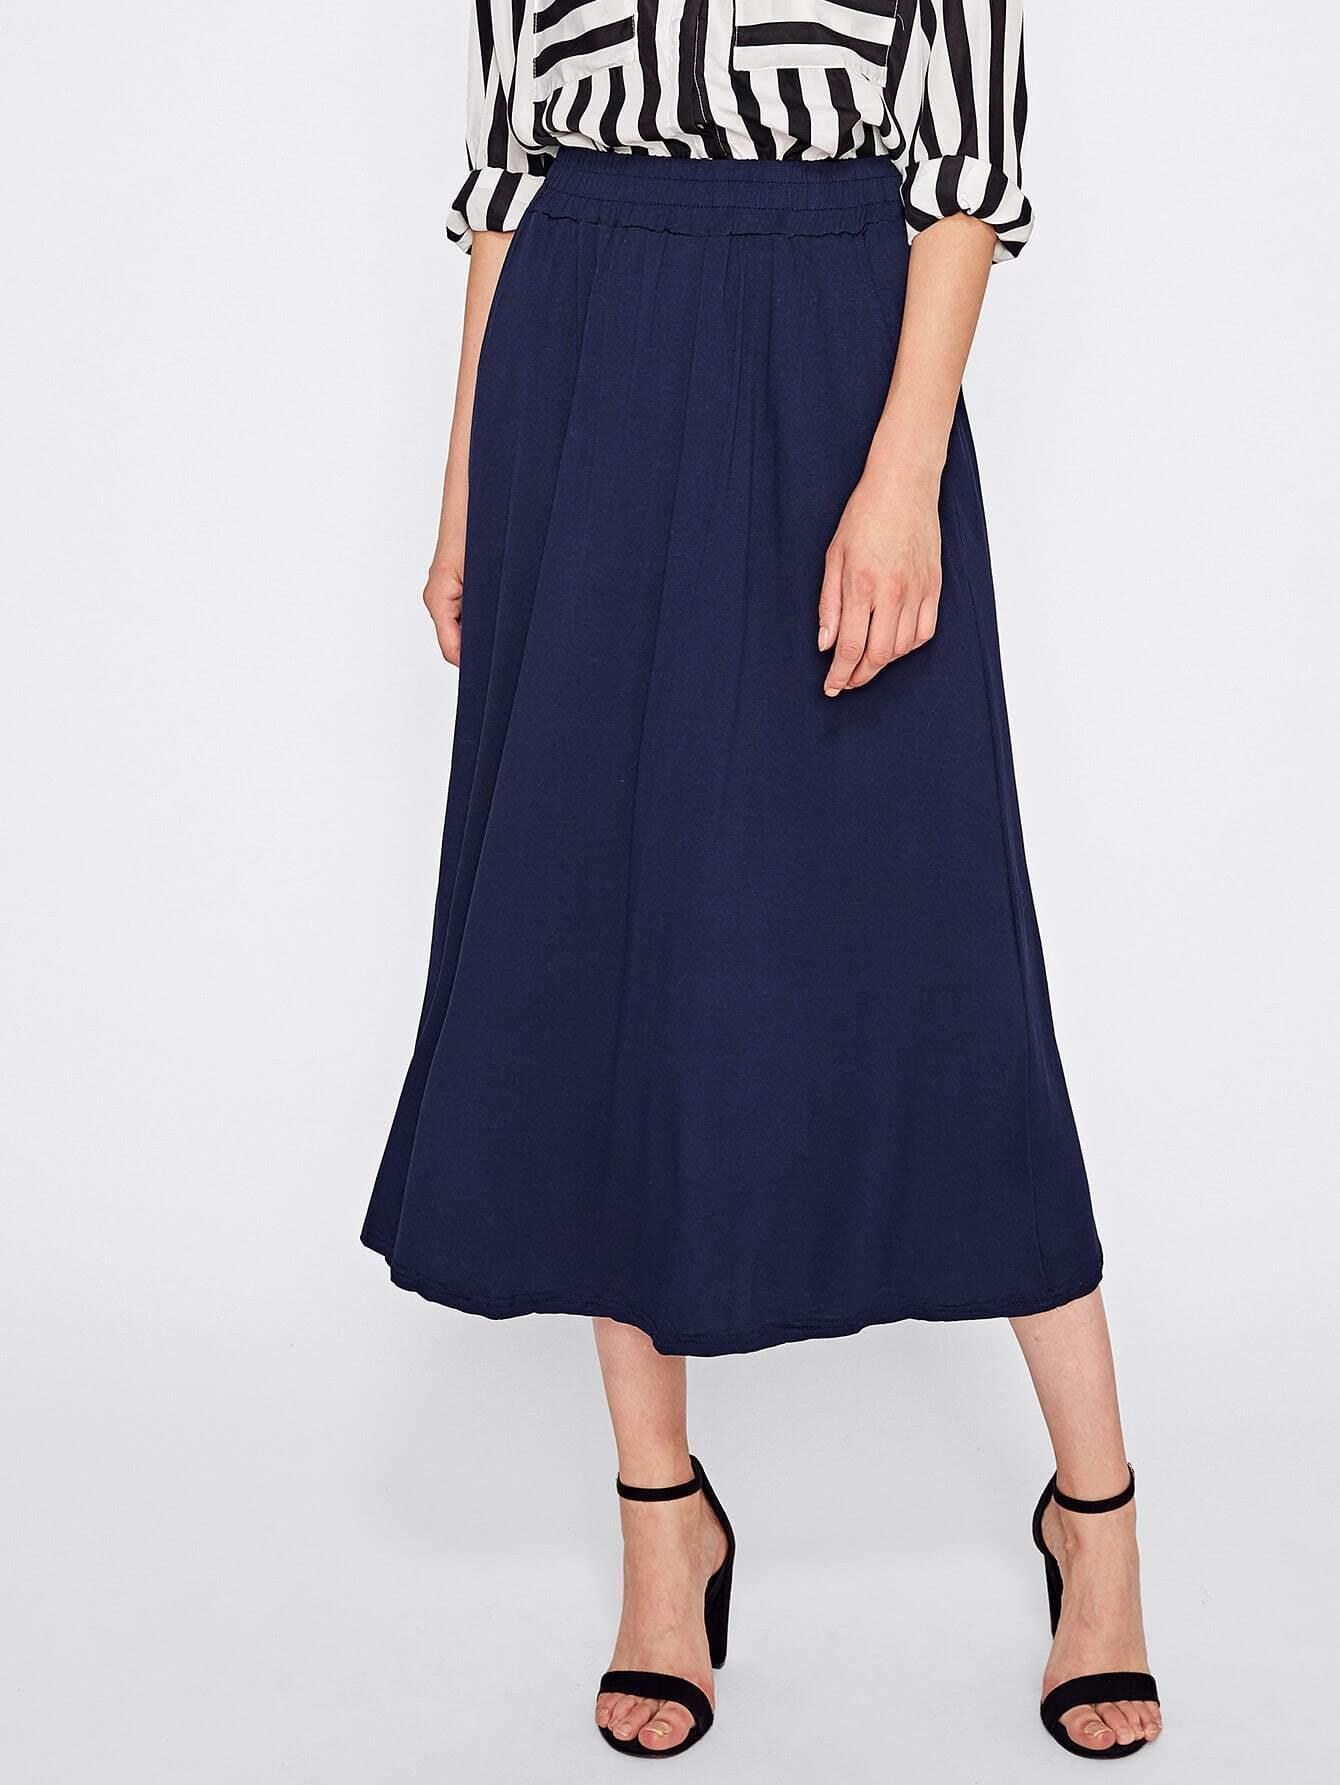 Wide Elasticized Waistband Skirt